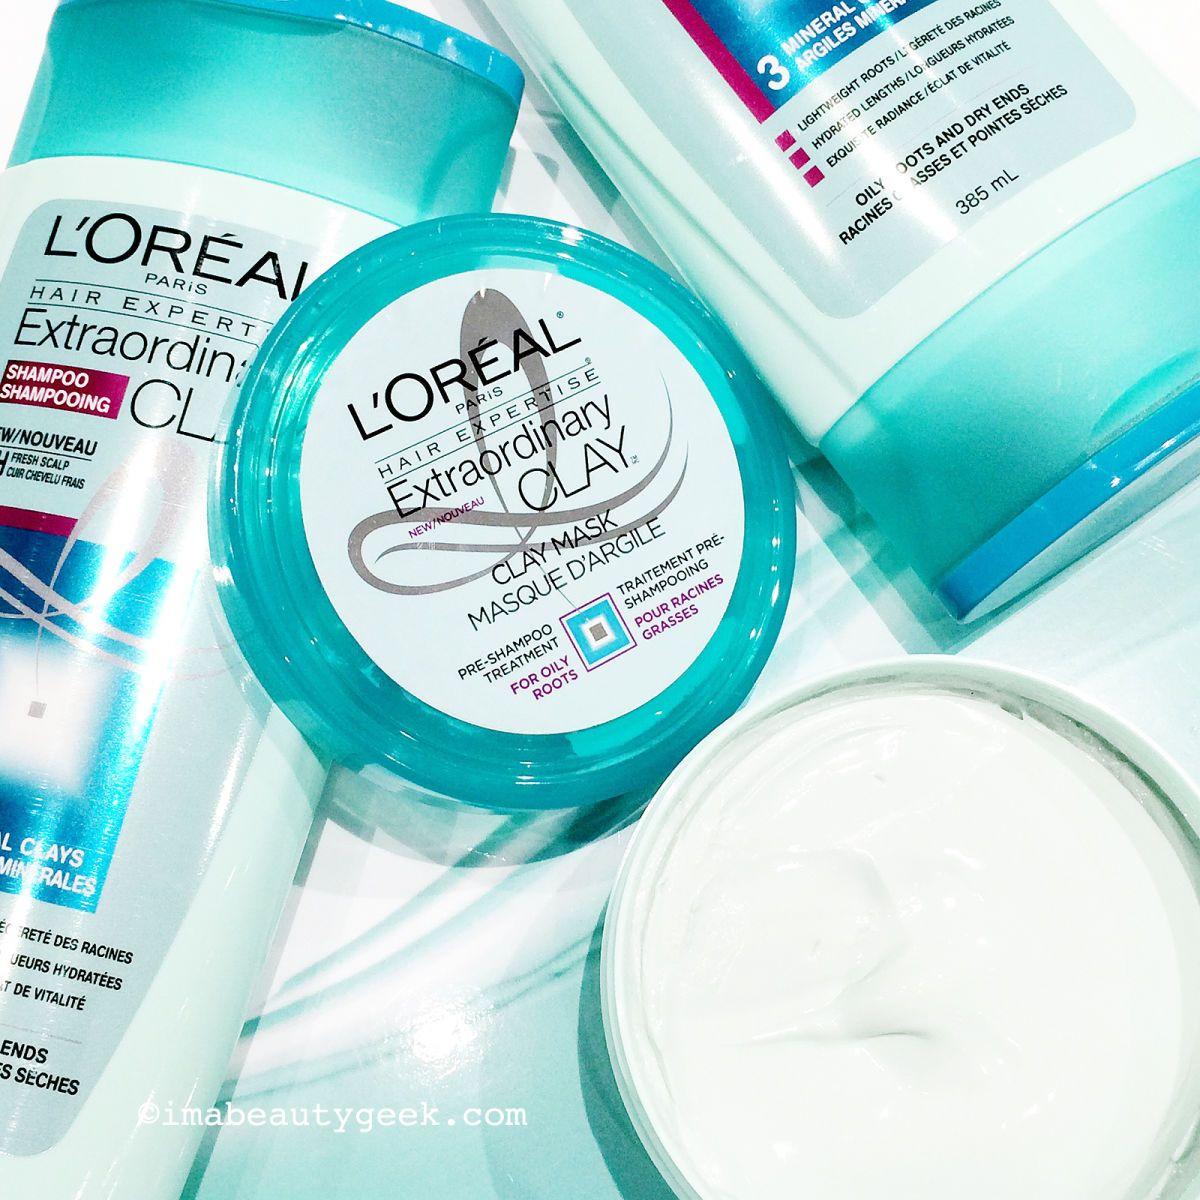 L'OREAL EXTRAORDINARY CLAY HAIRCARE Beautygeeks Loreal